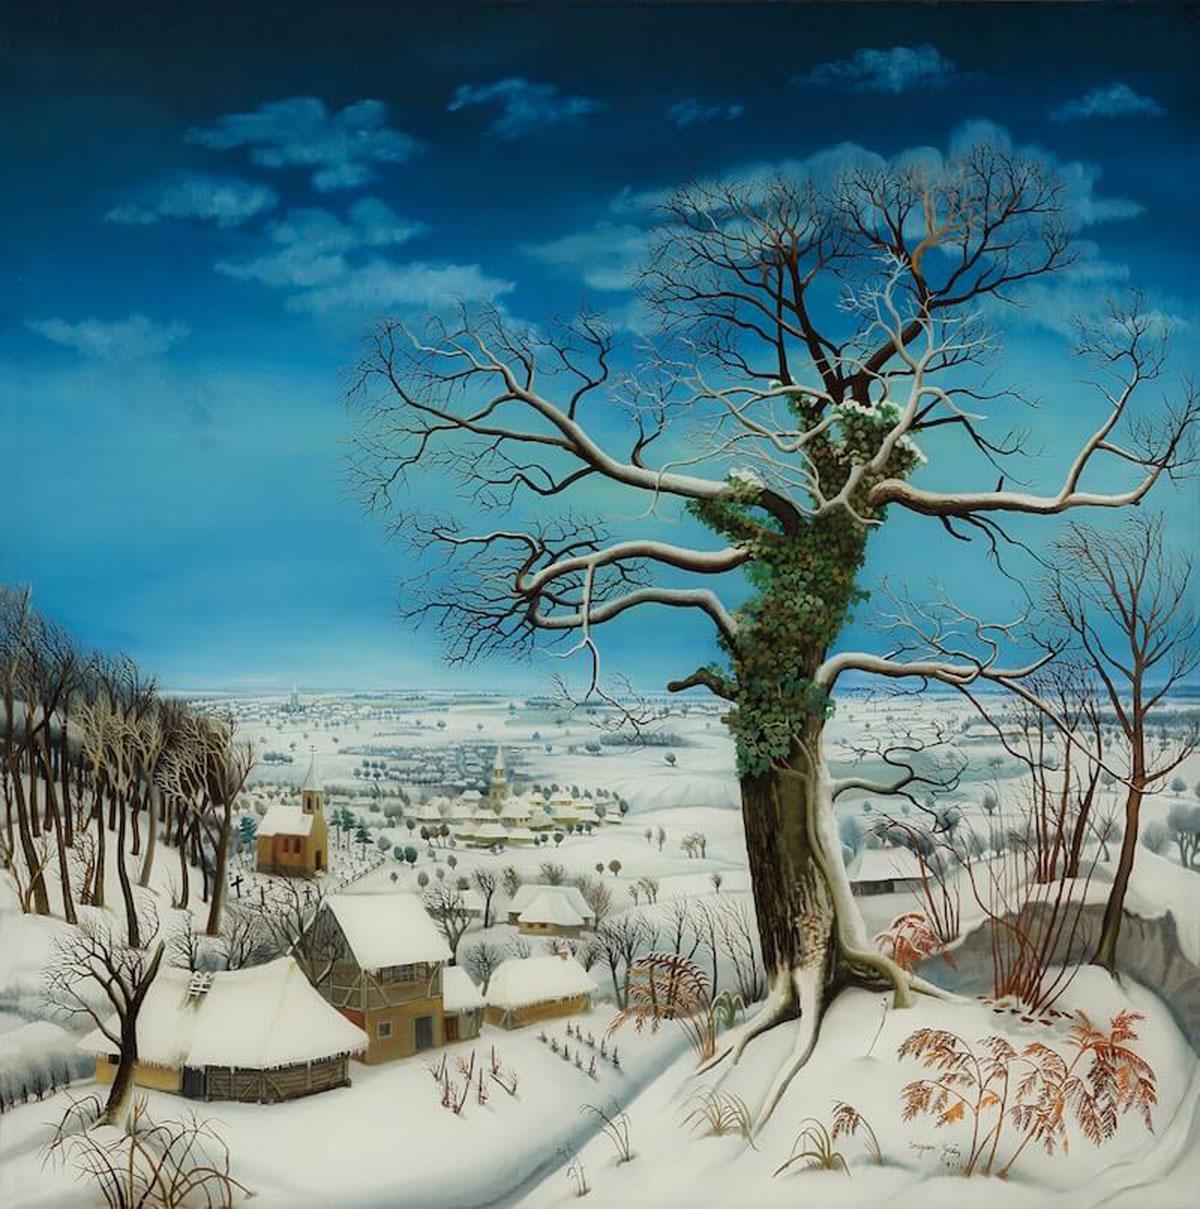 Vjetar u zimi / The Wind in Winter (1973) by Dragan Gaži. Photo credit: The Croatian Museum of Naïve Art, Zagreb